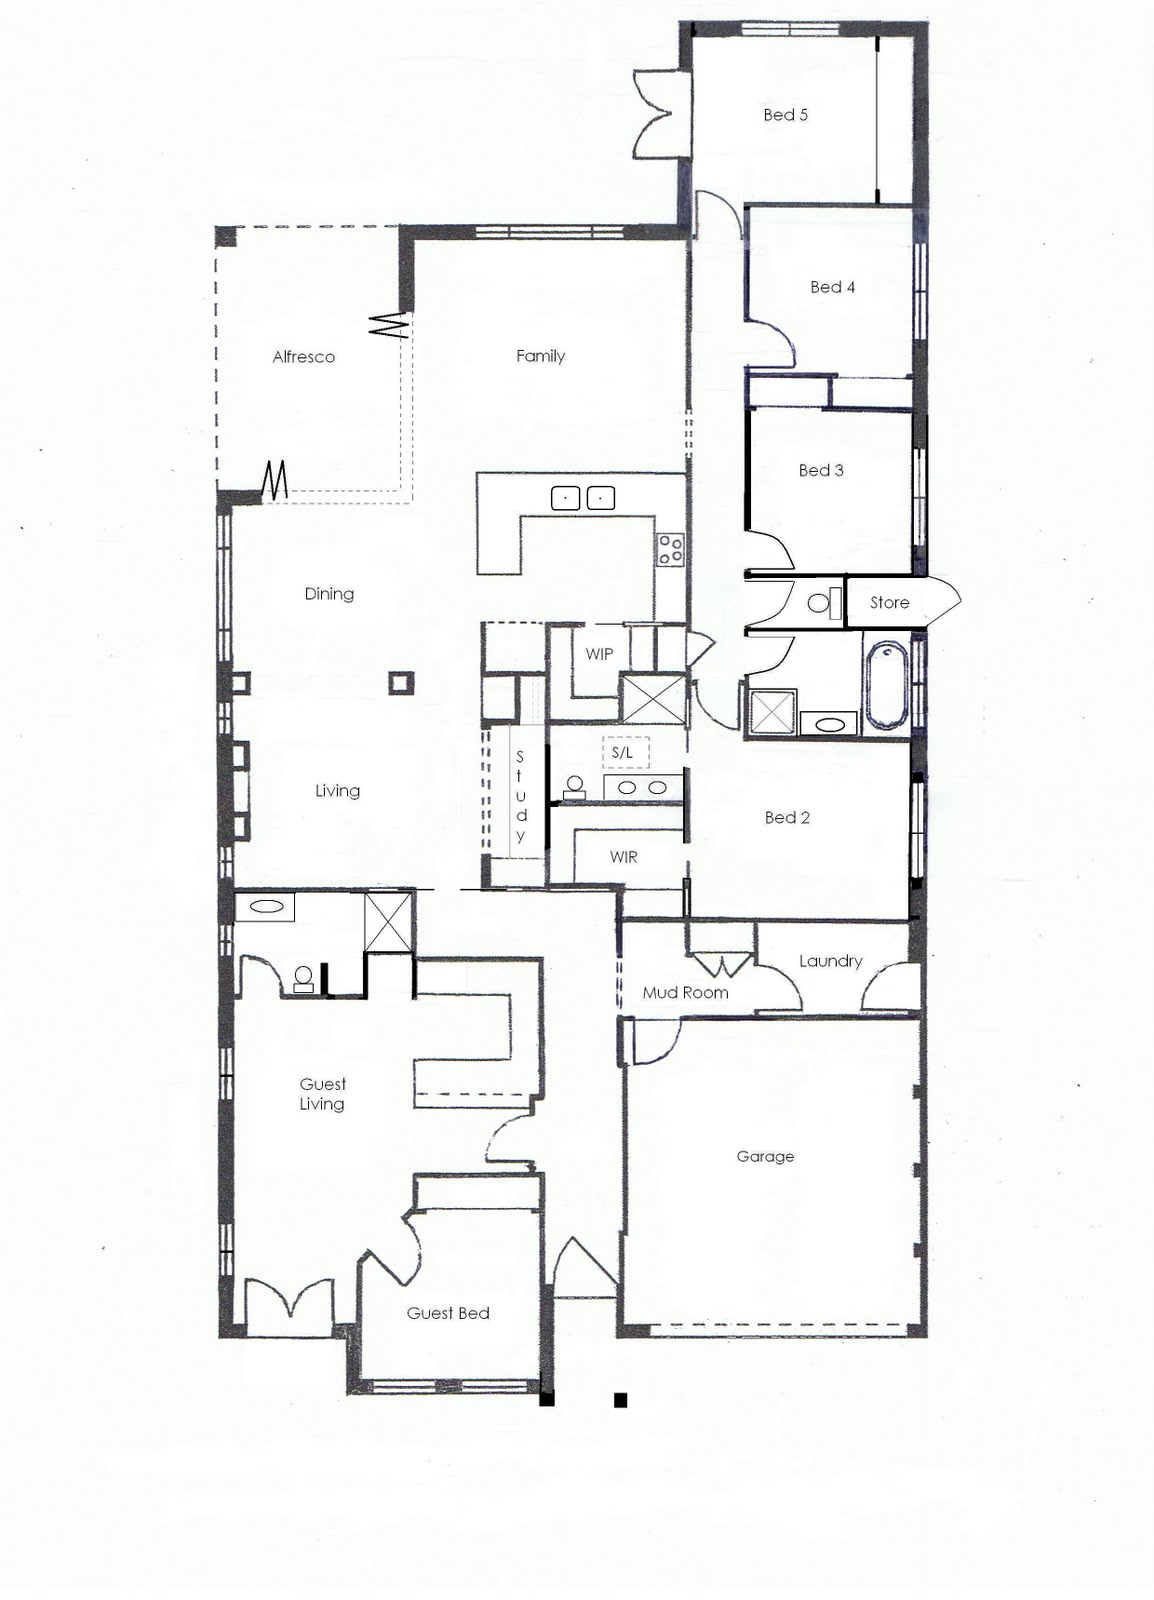 Keeping Up With The Joneses Floor Plan Sketch